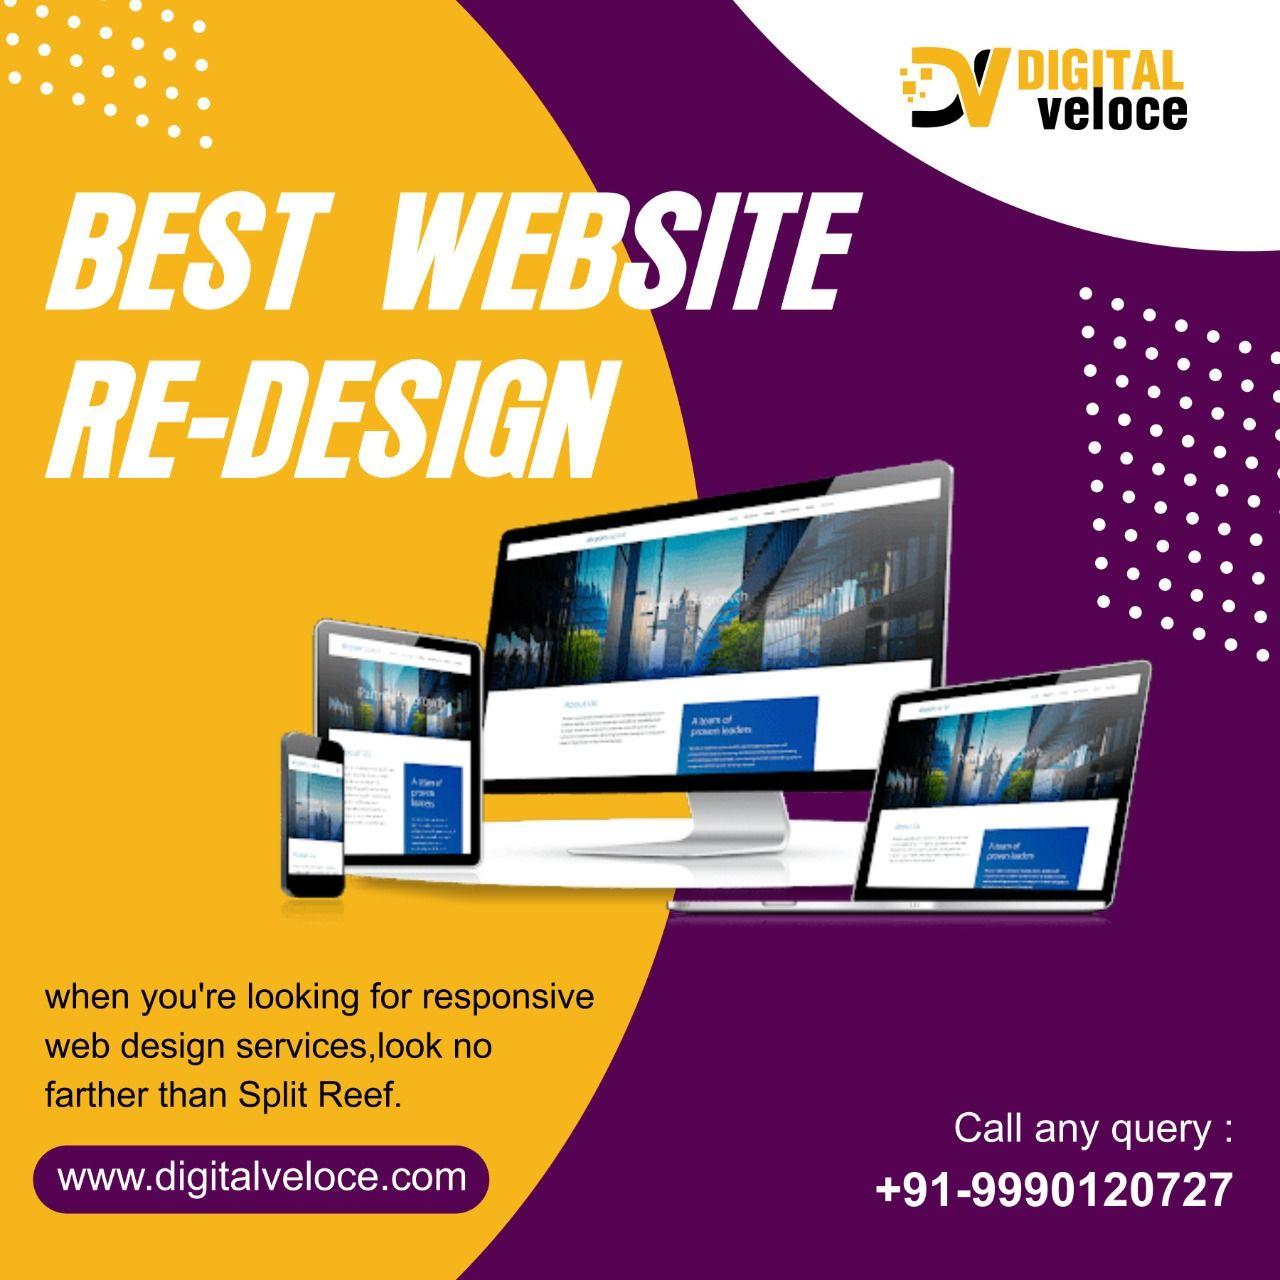 Website Re Design Services In 2020 Web Design Services Website Design Wordpress Service Design